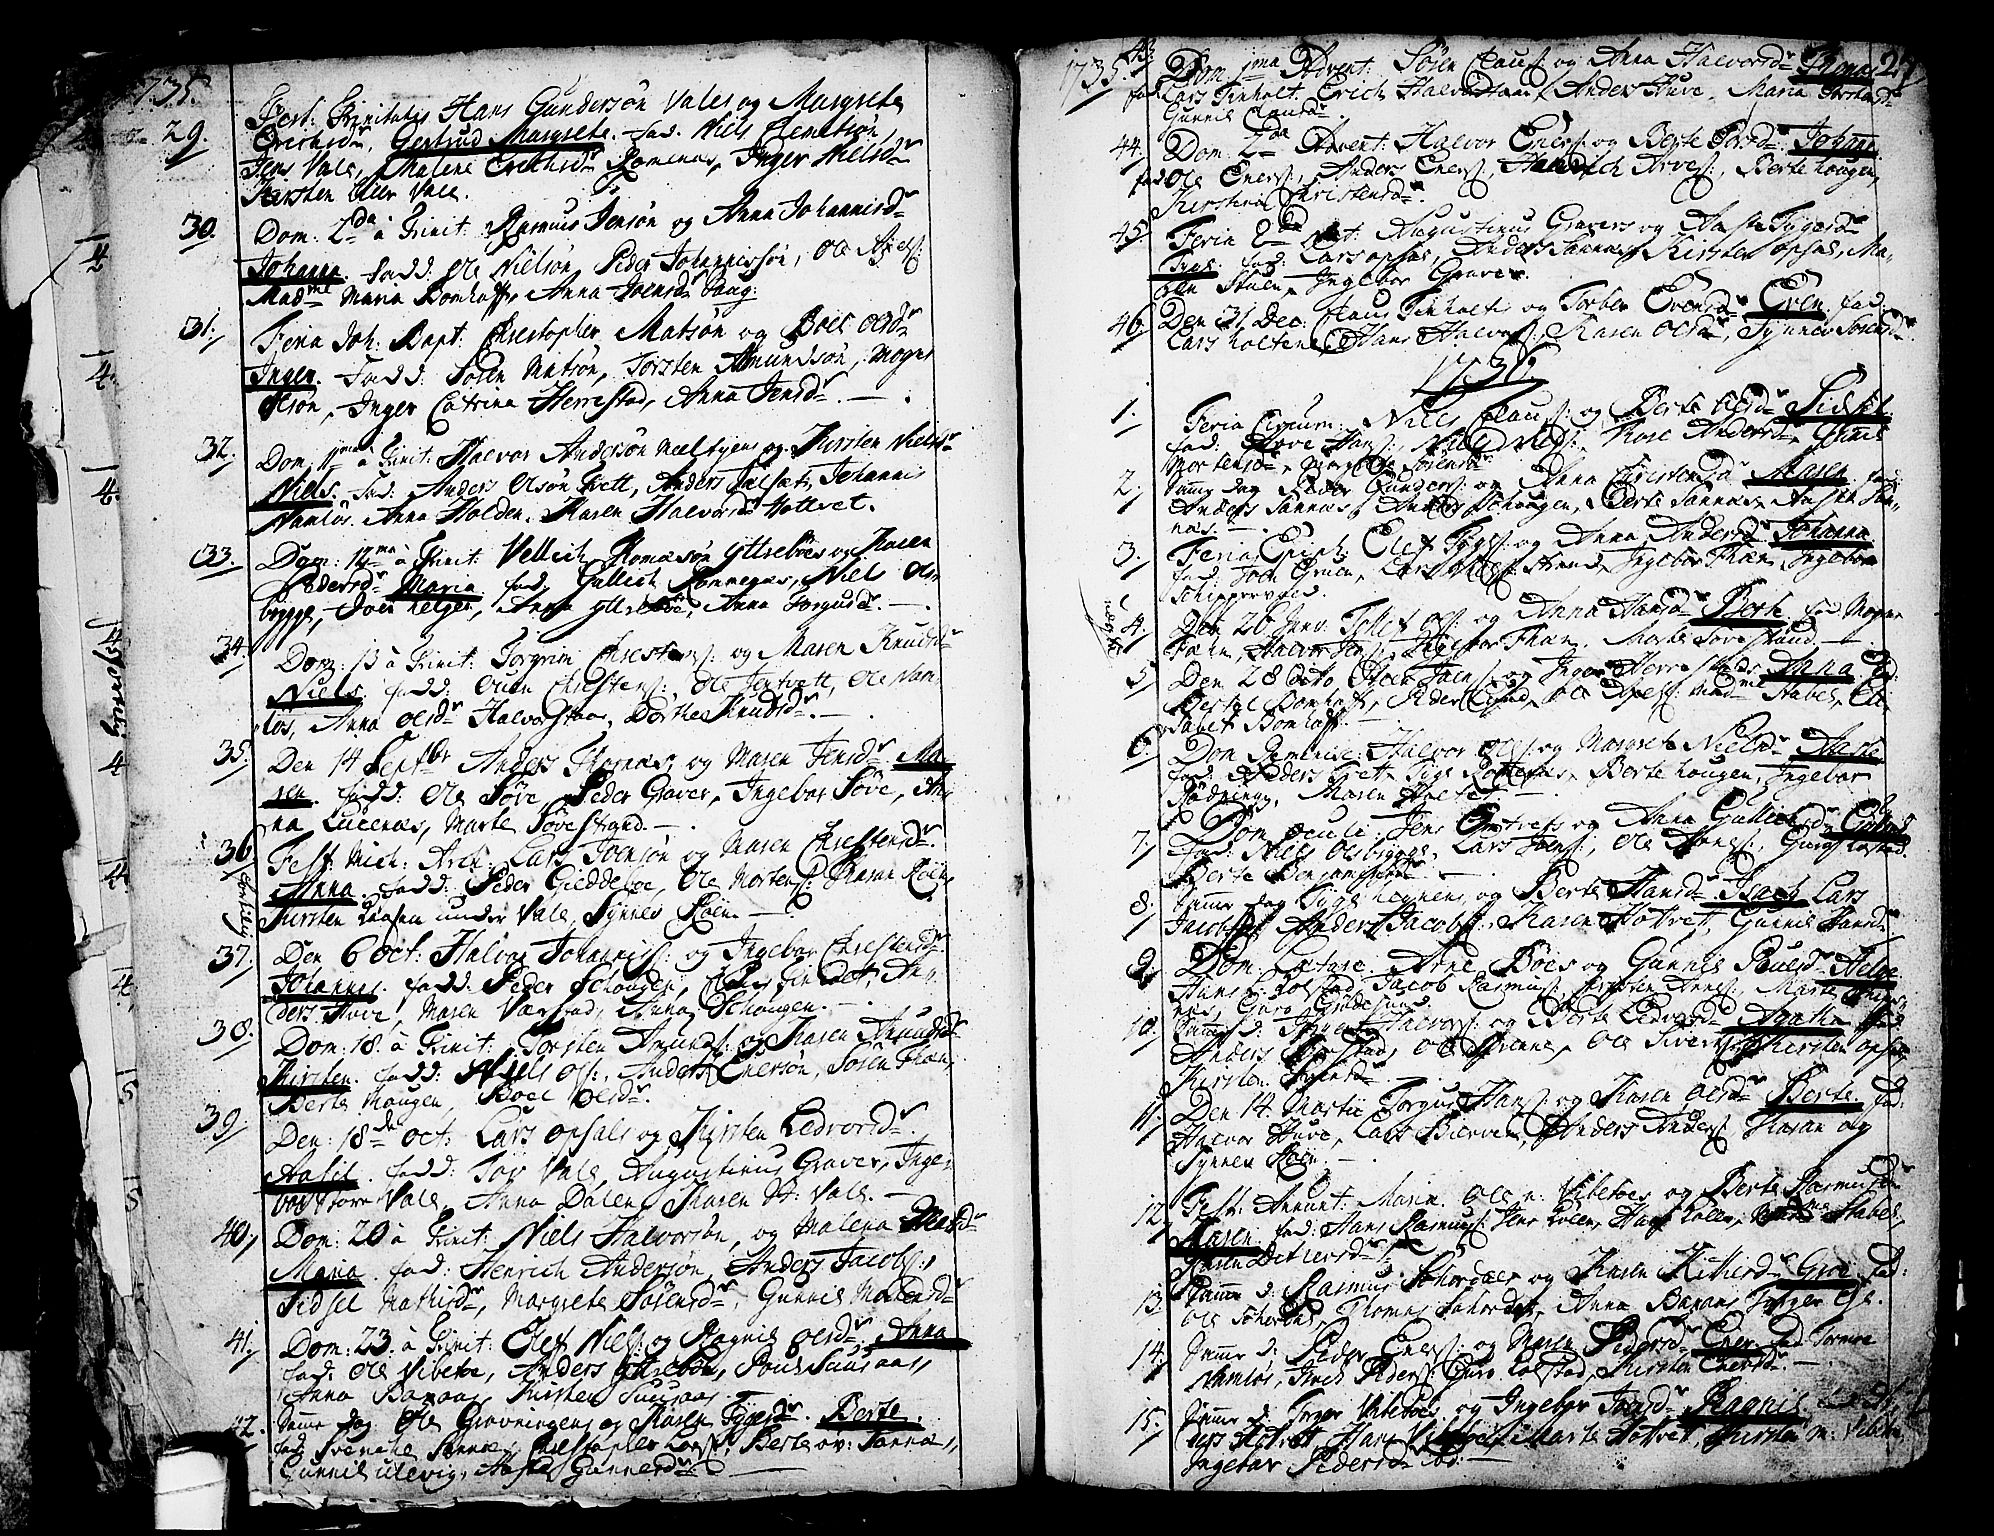 SAKO, Holla kirkebøker, F/Fa/L0001: Ministerialbok nr. 1, 1717-1779, s. 27